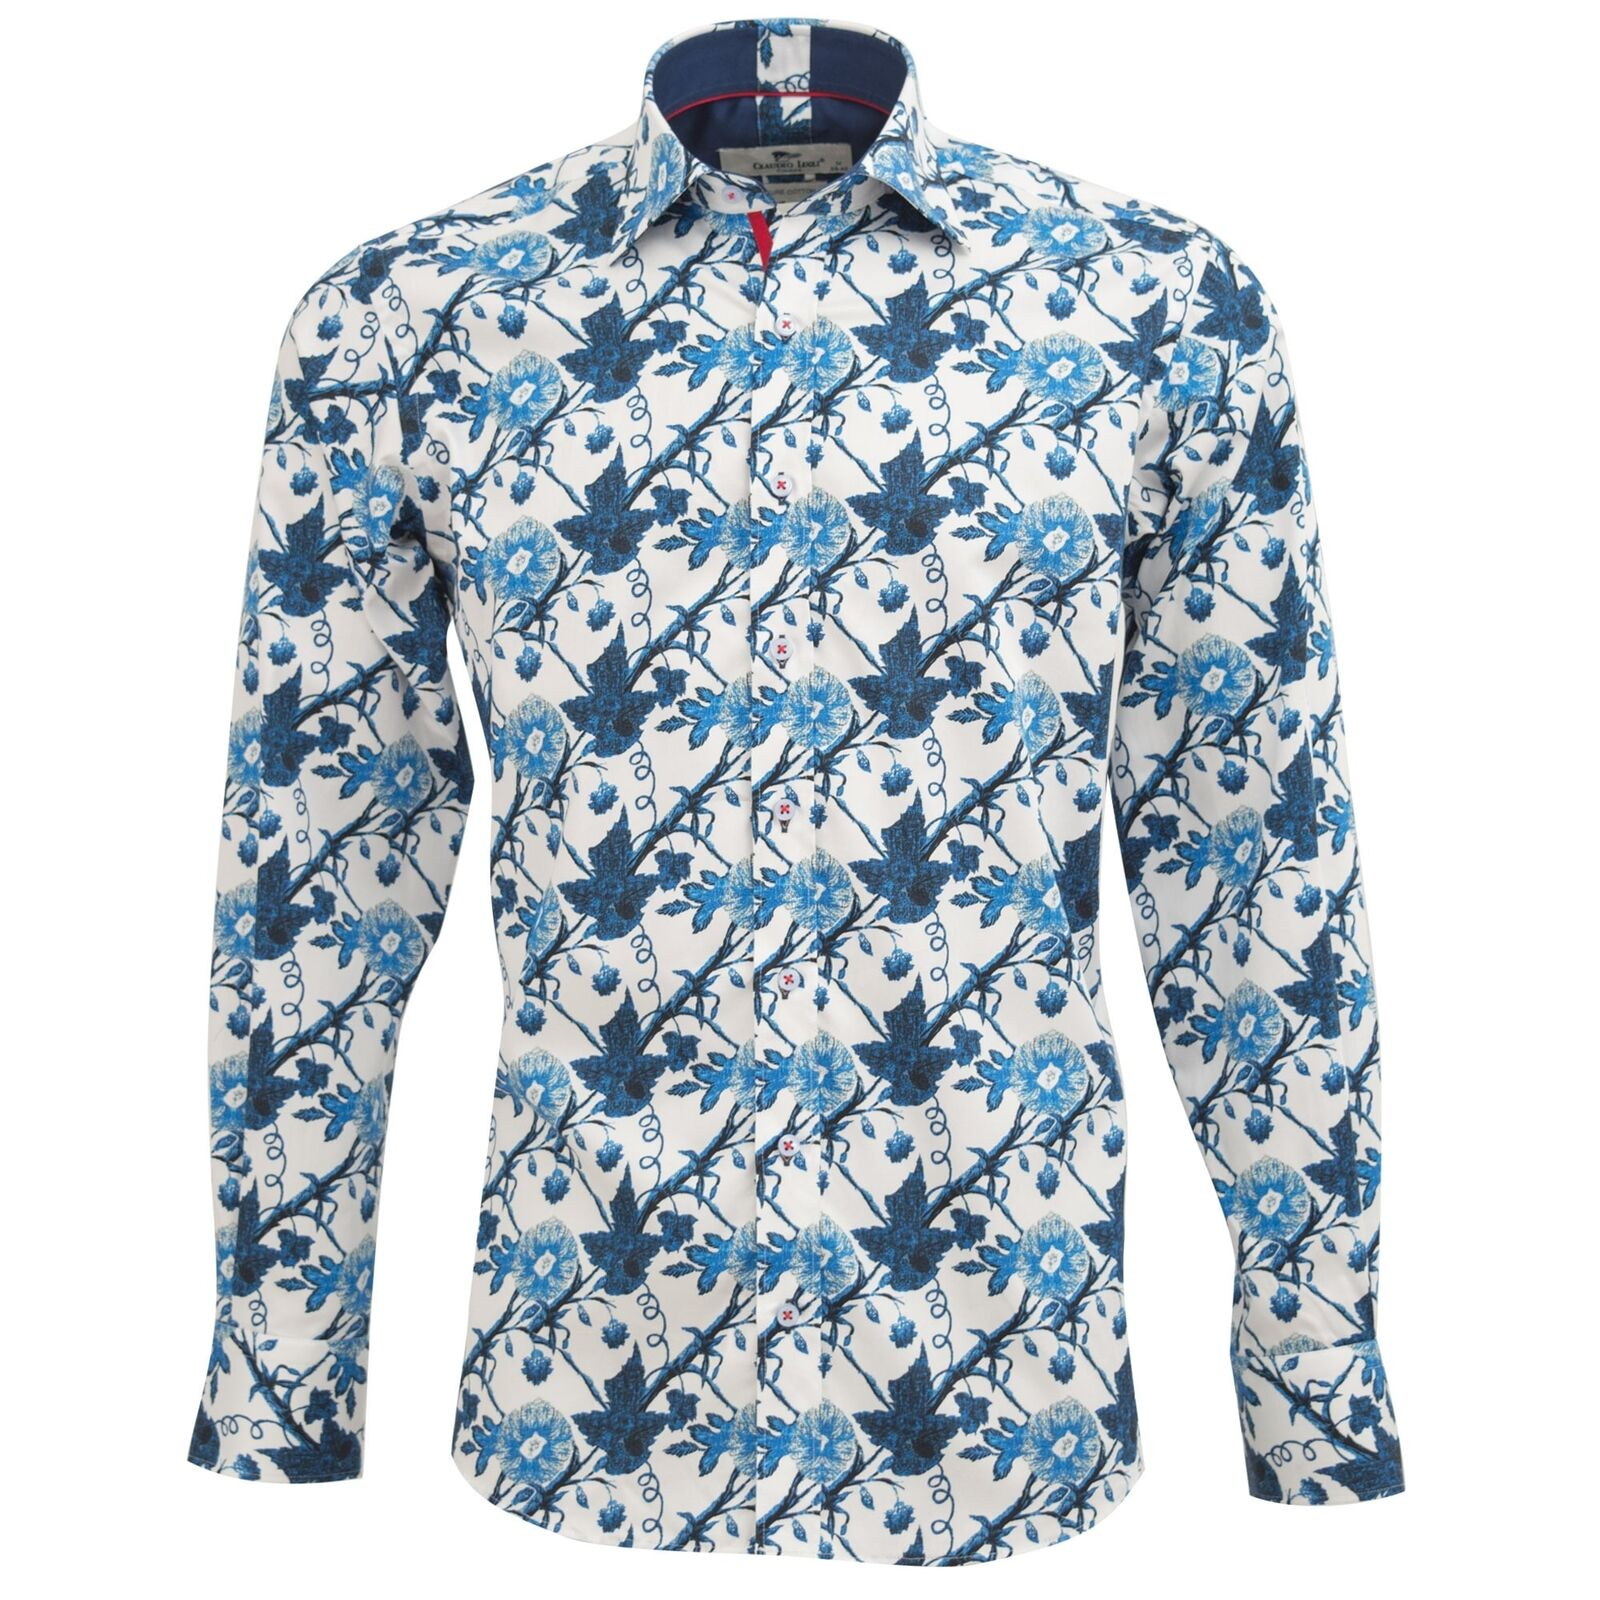 Claudio Lugli Indigo Floral Print Fashion Cotton Spring Mens Casual Shirt bluee